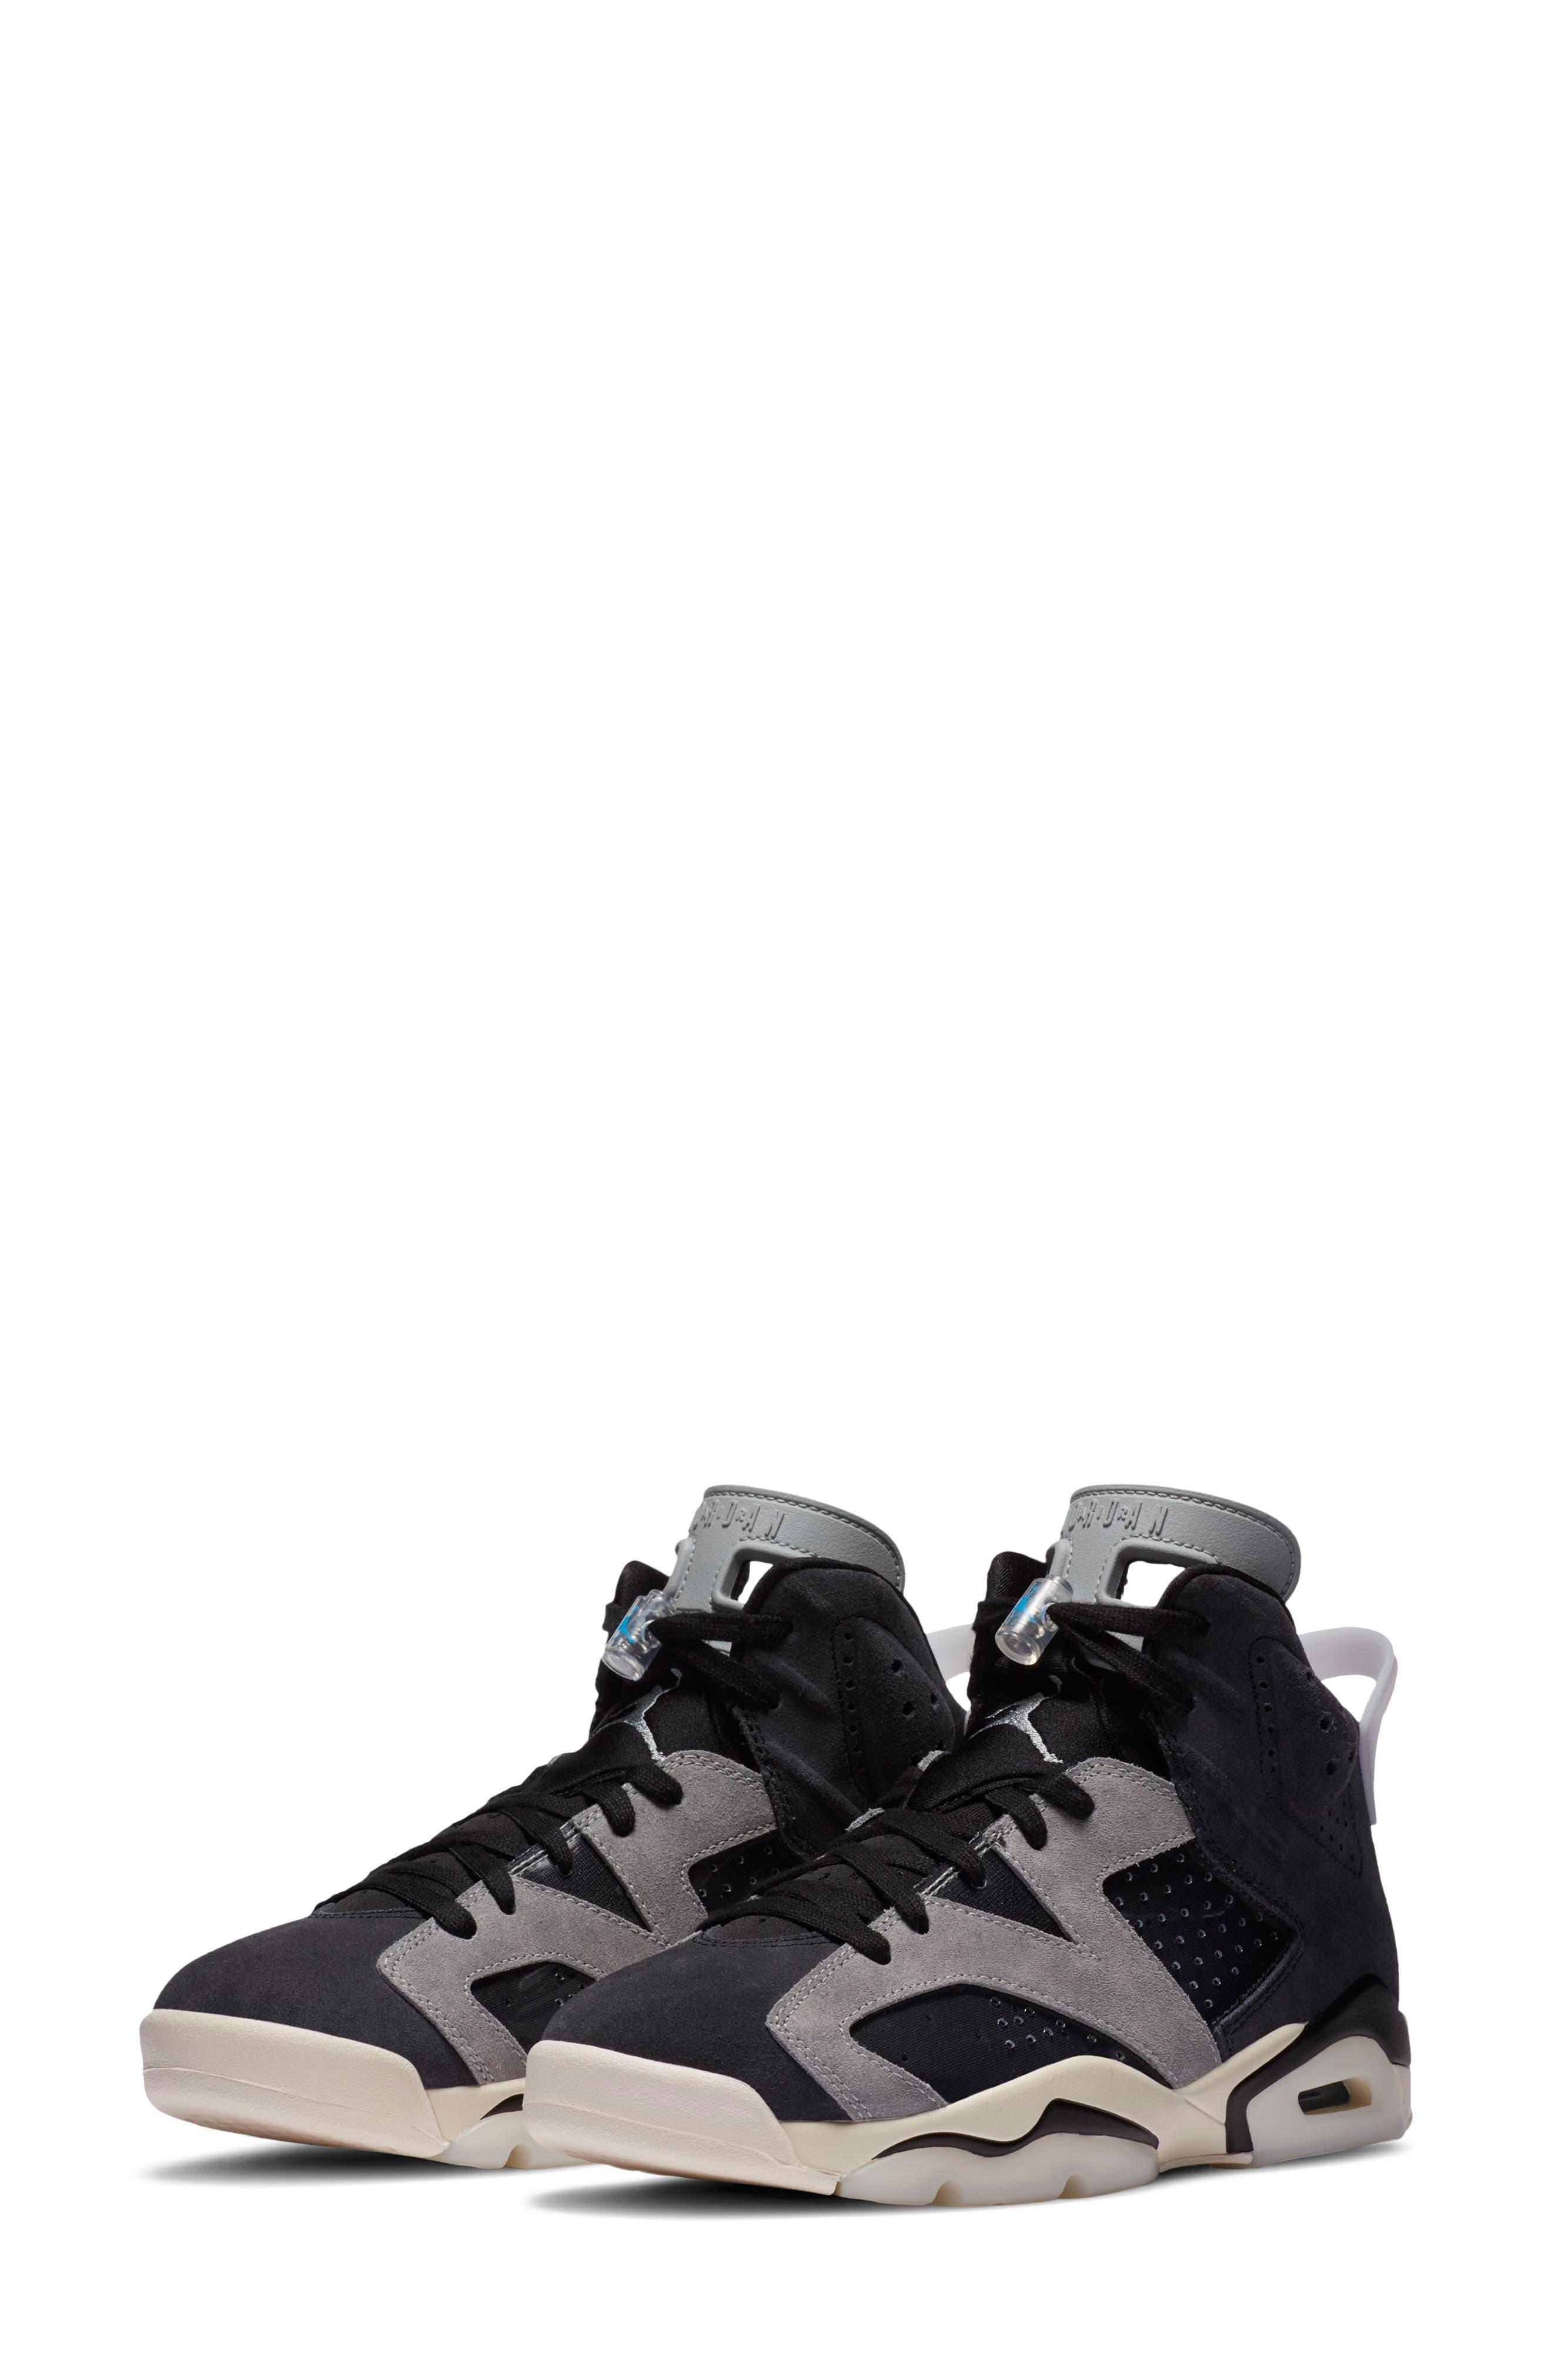 Jordan Shop All Nordstrom X Nike